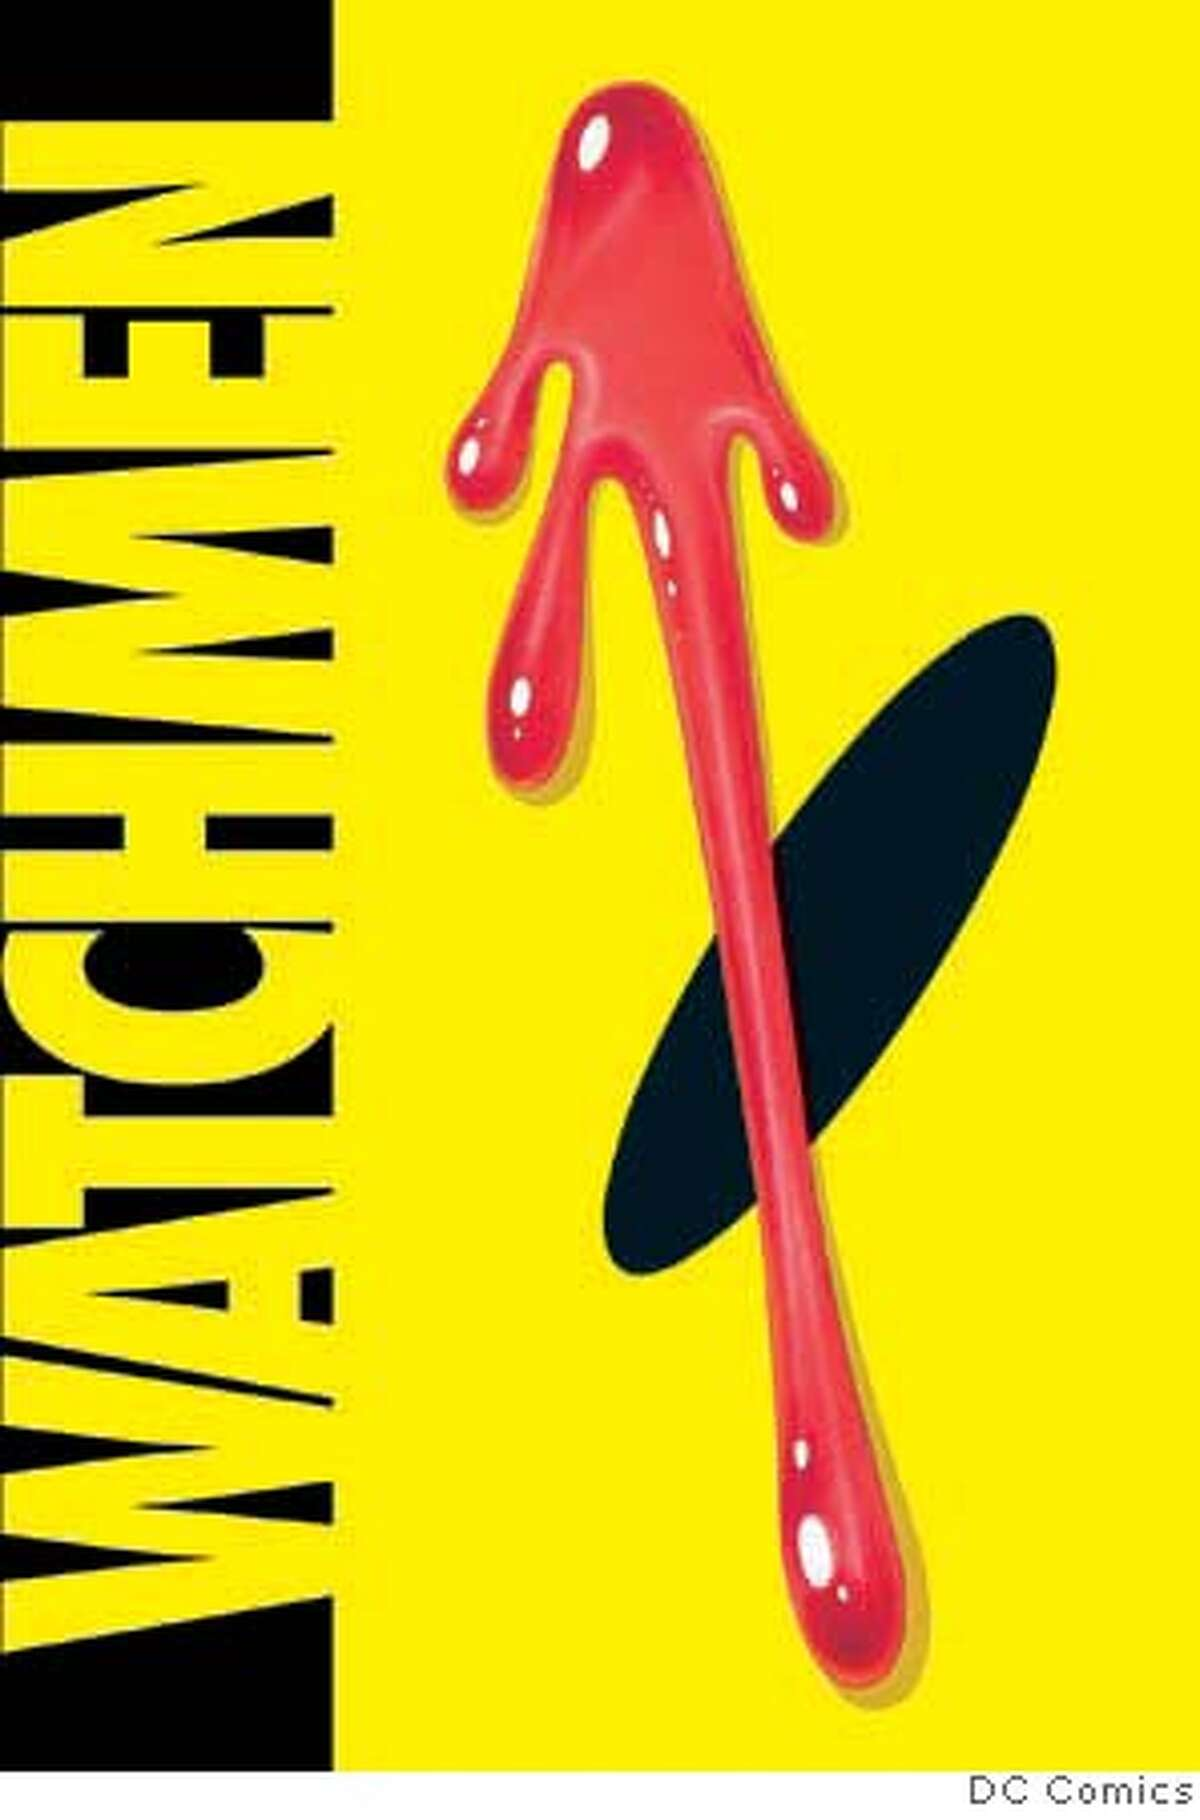 """Watchmen"" by DC Comics Credit: DC Comics"